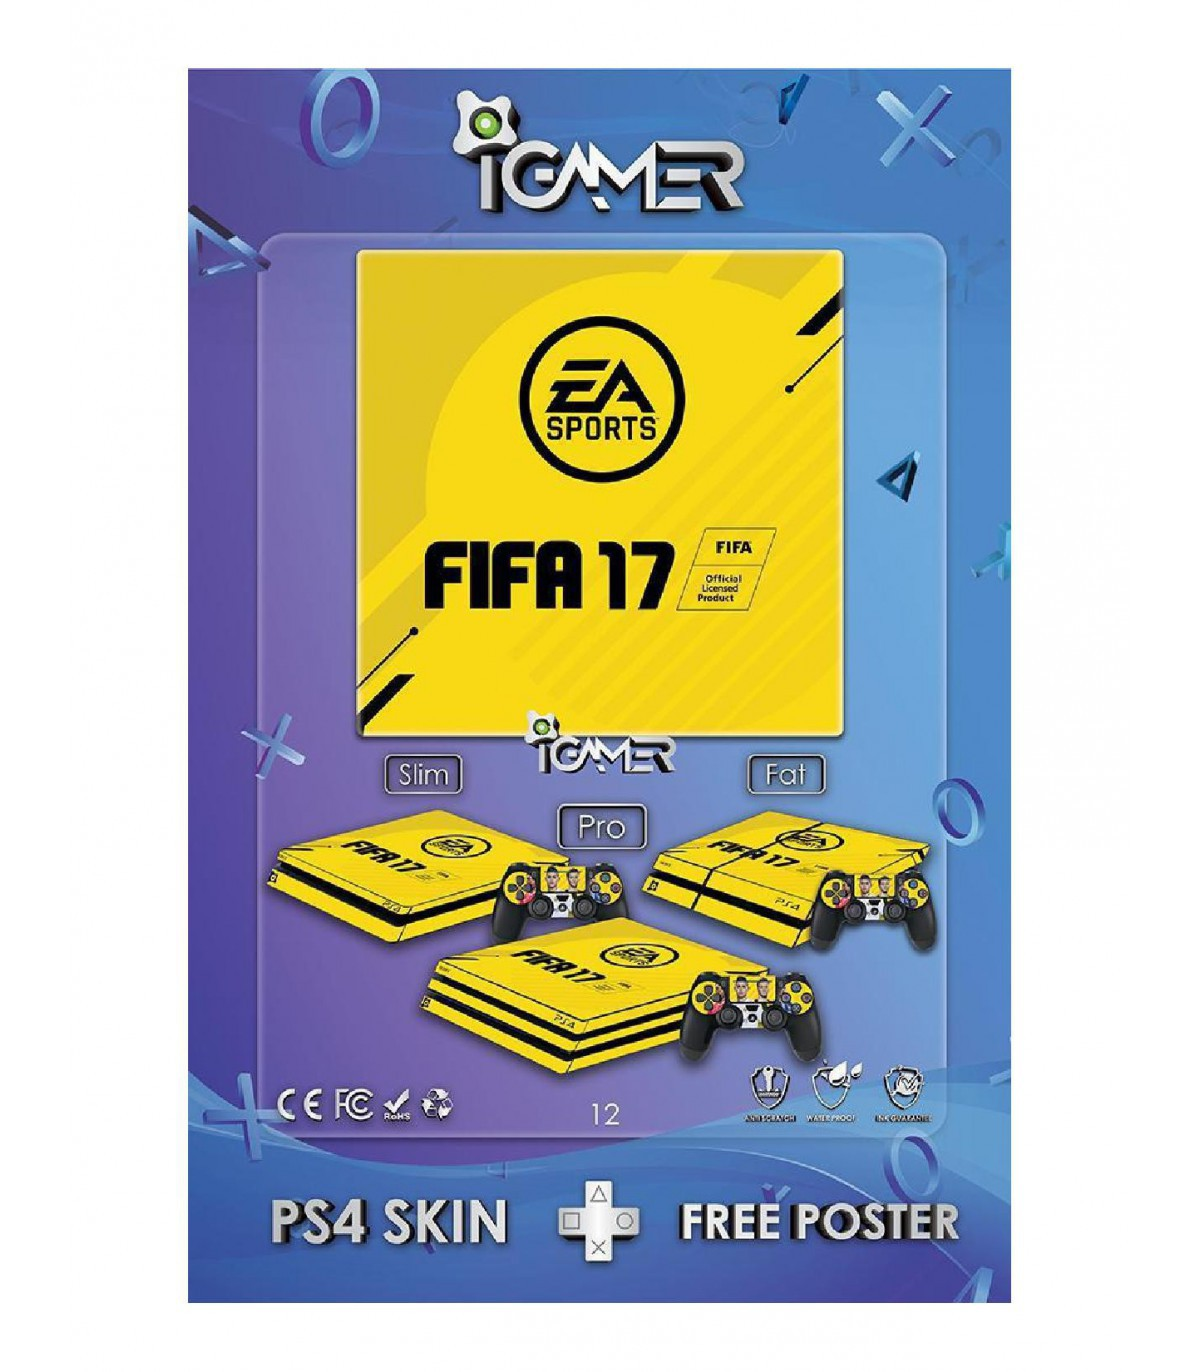 اسکین PS4 طرح FIFA17